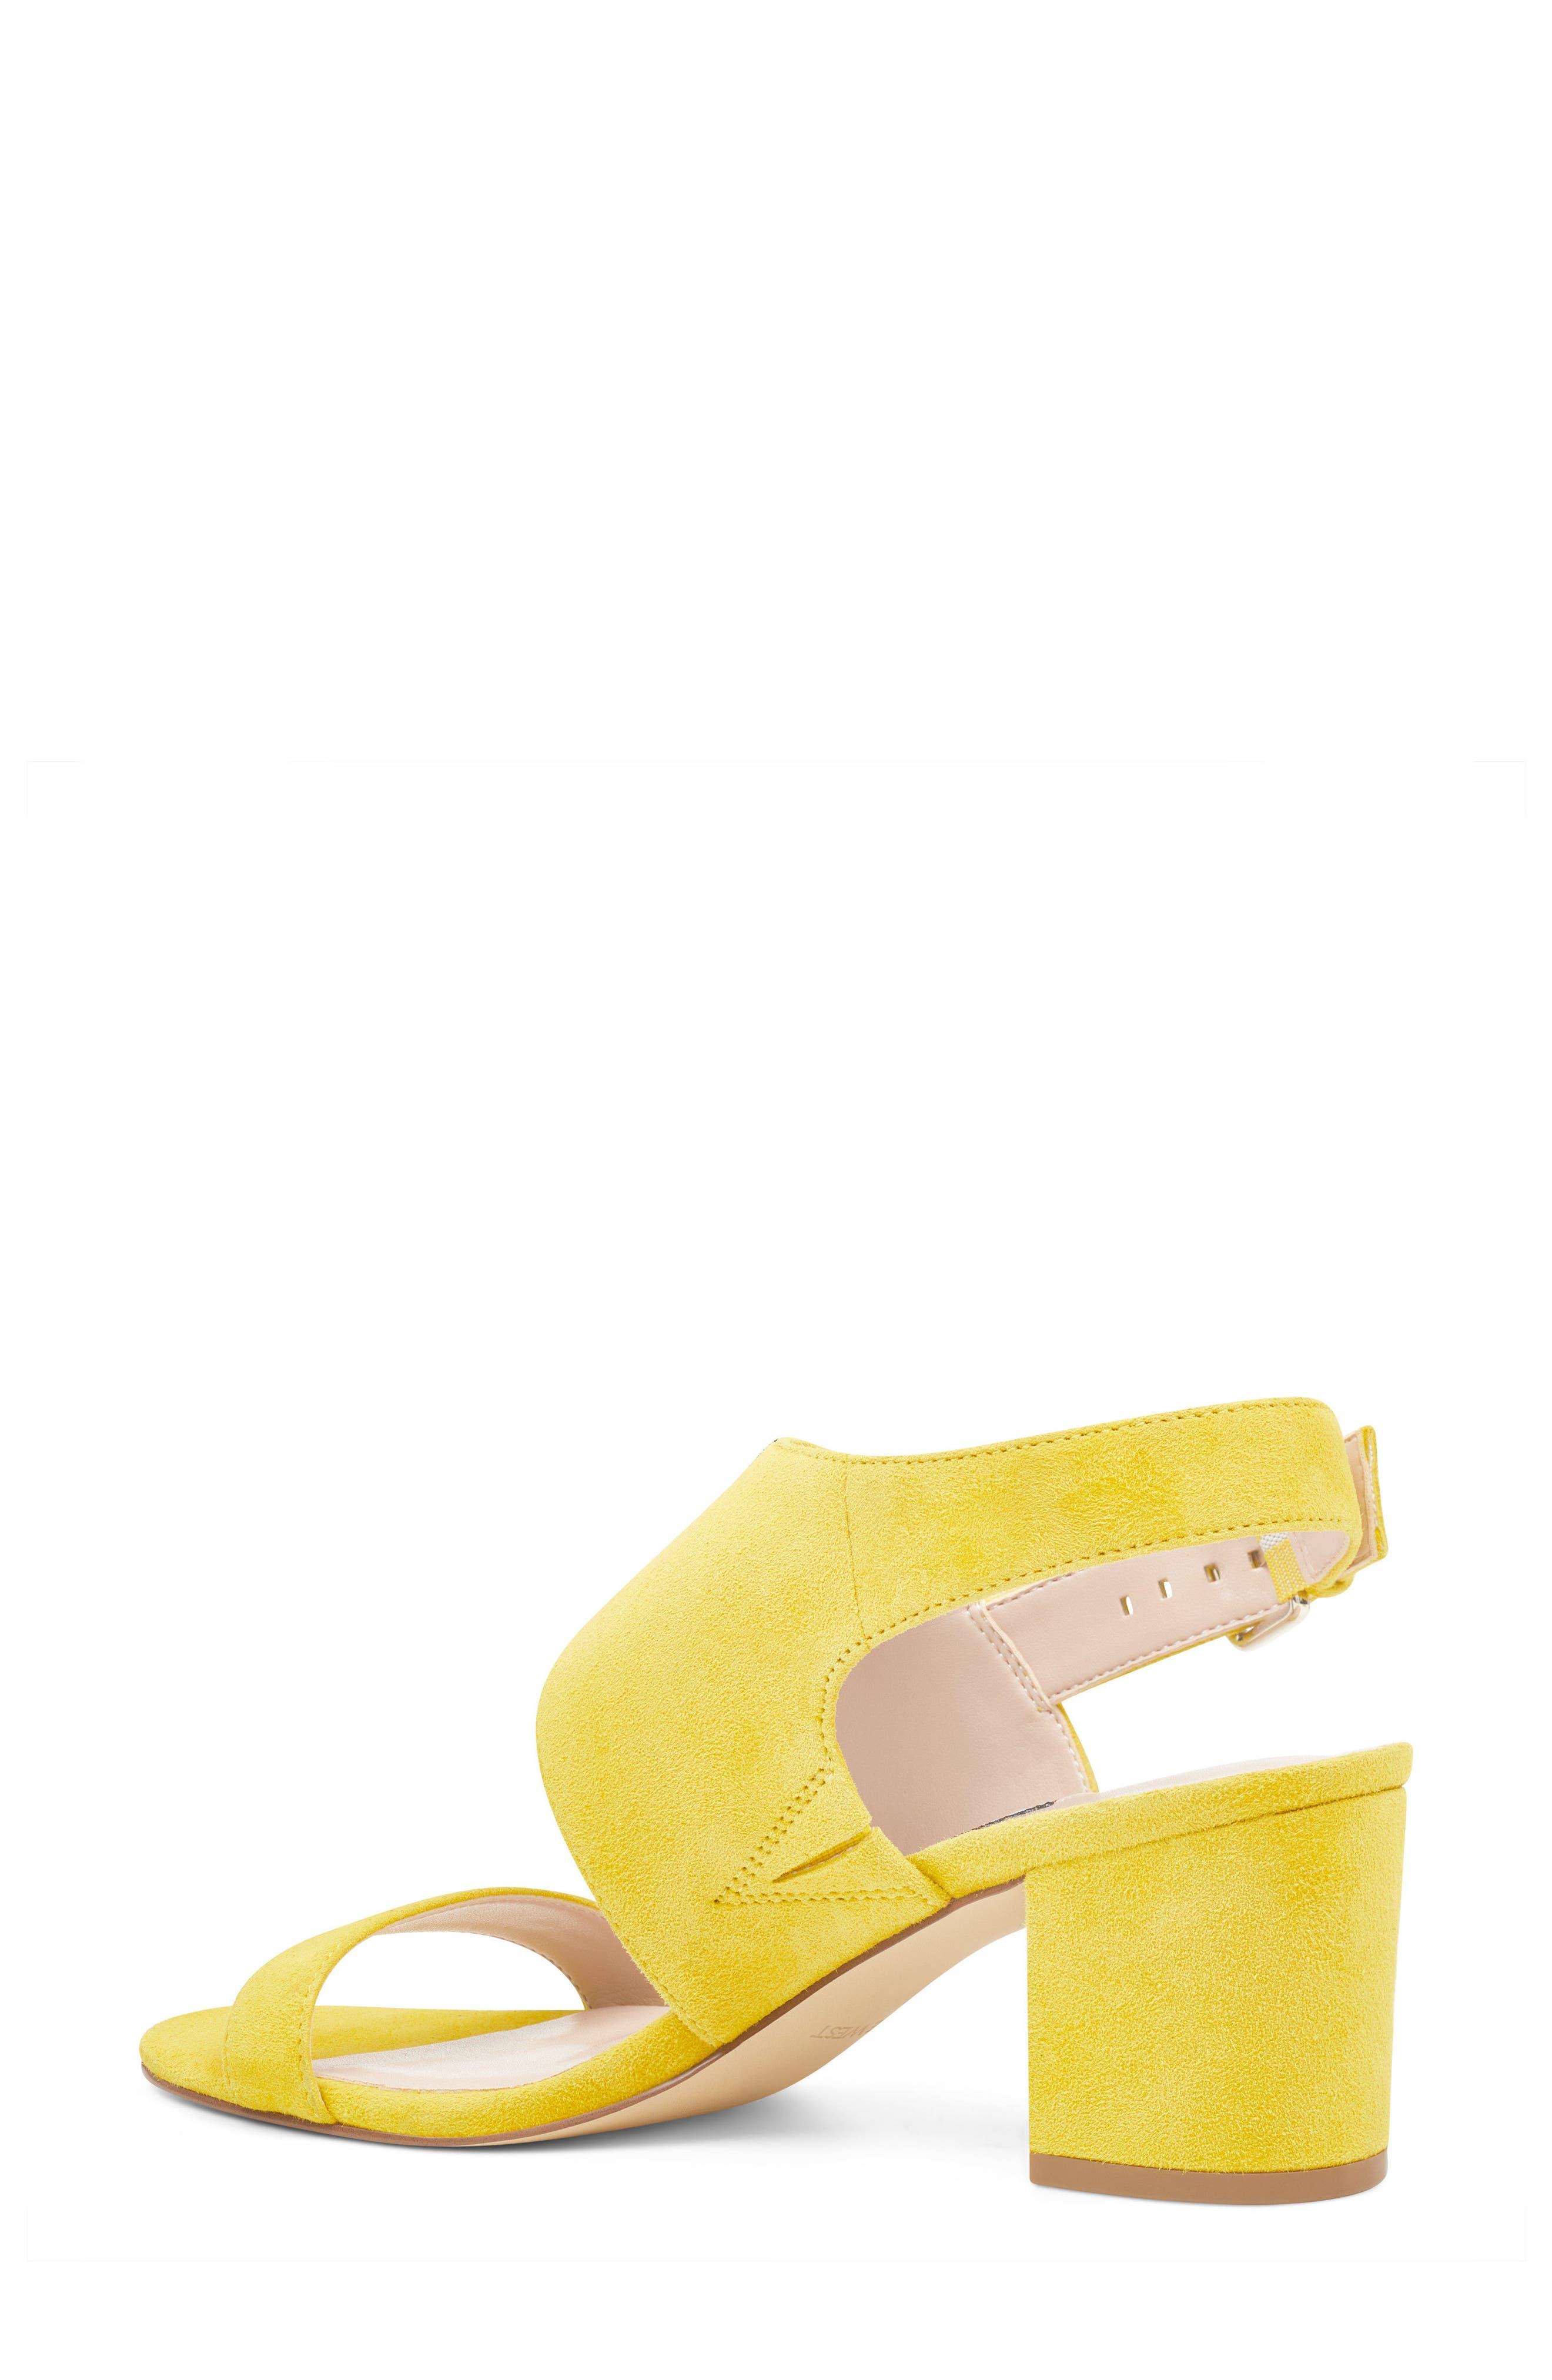 Forli Asymmetrical Sandal,                             Alternate thumbnail 2, color,                             Yellow Suede